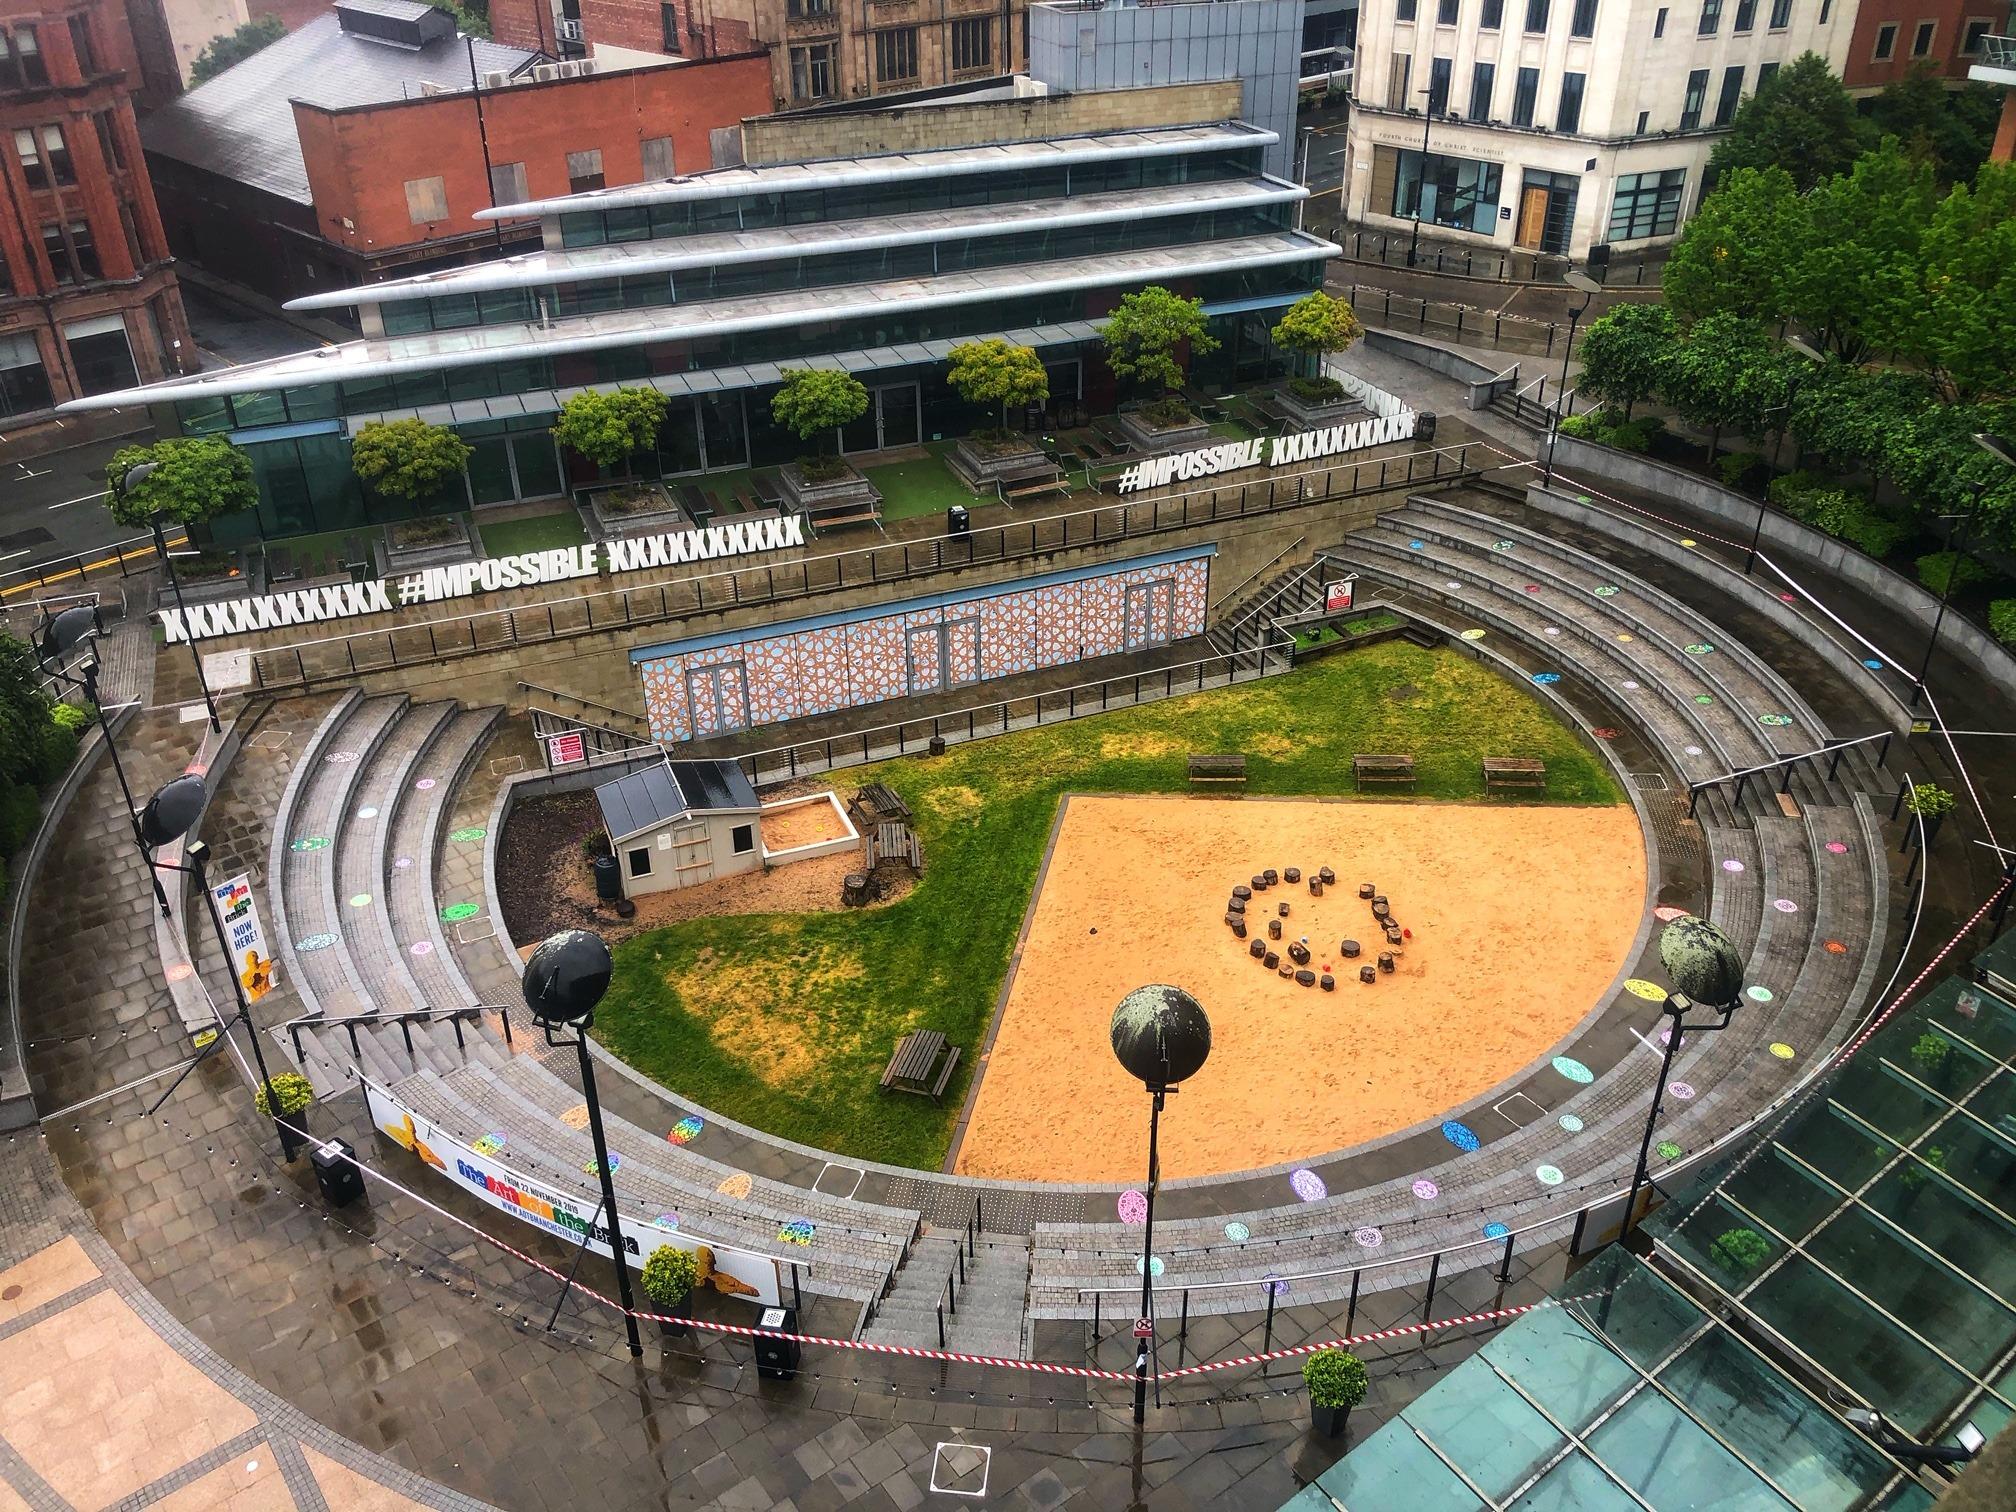 Best Manchester outdoor theatres